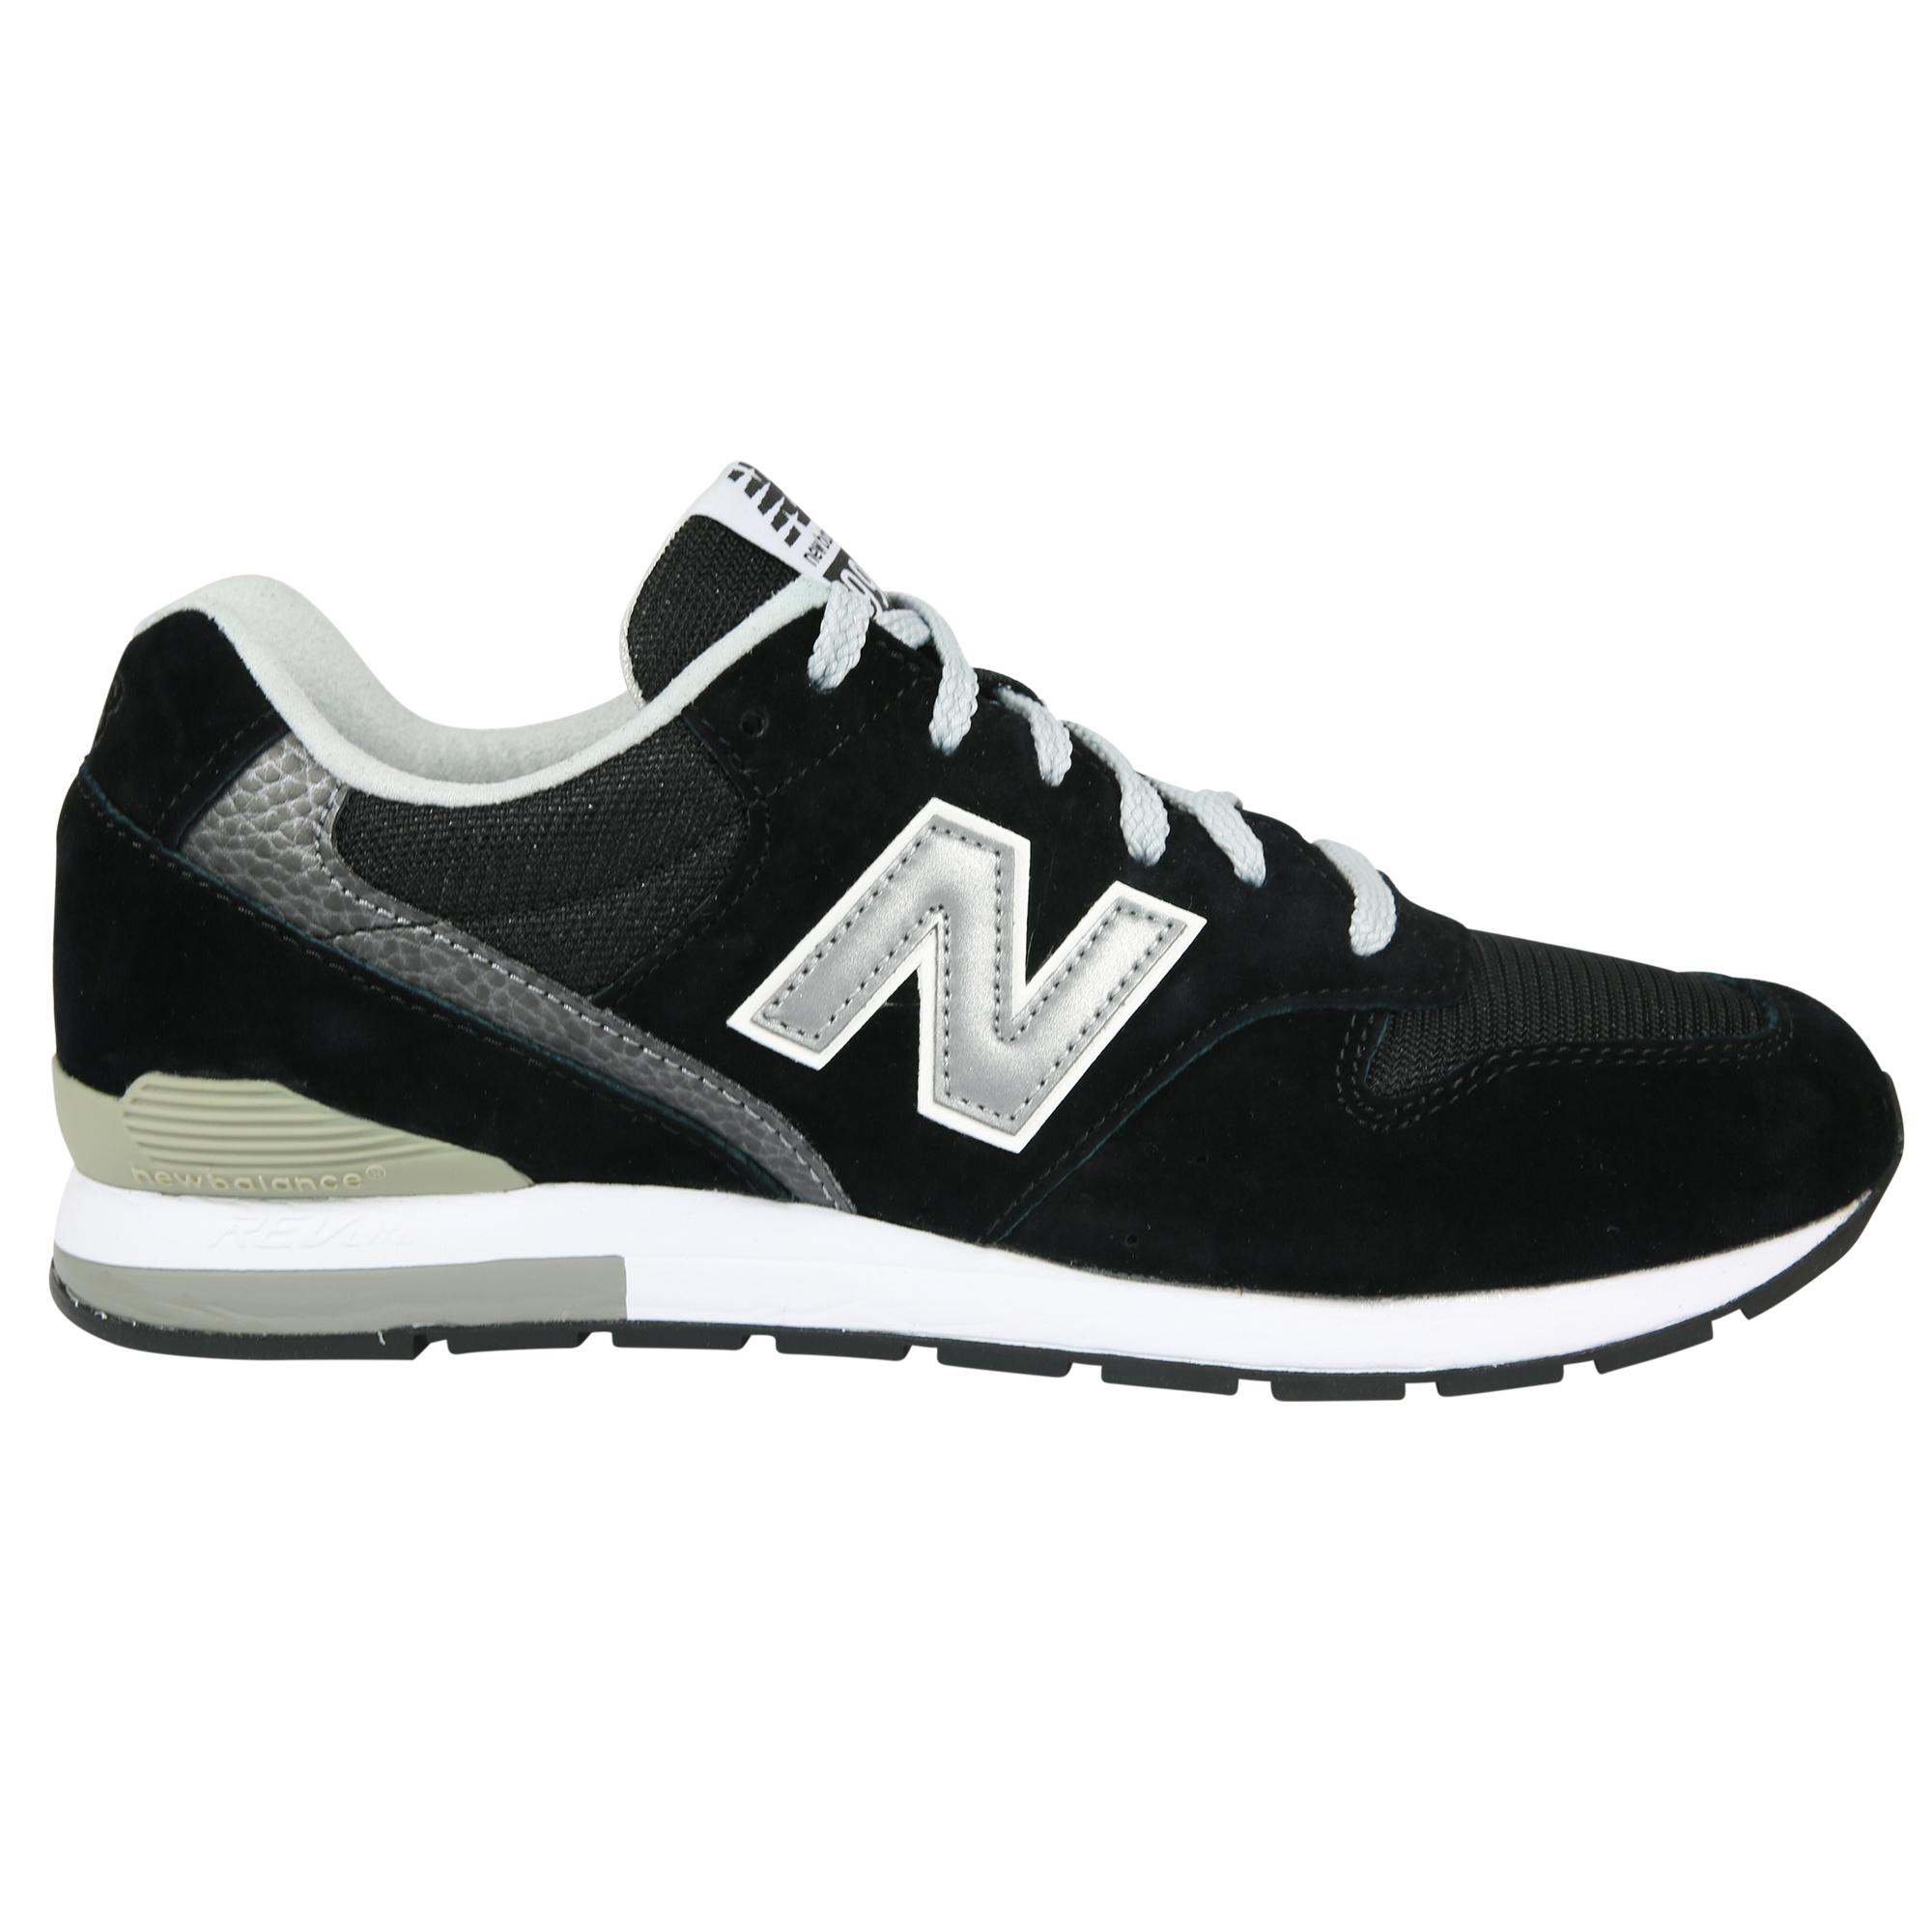 New-Balance-996-Schuhe-Turnschuhe-Sneaker-Herren-MRL996